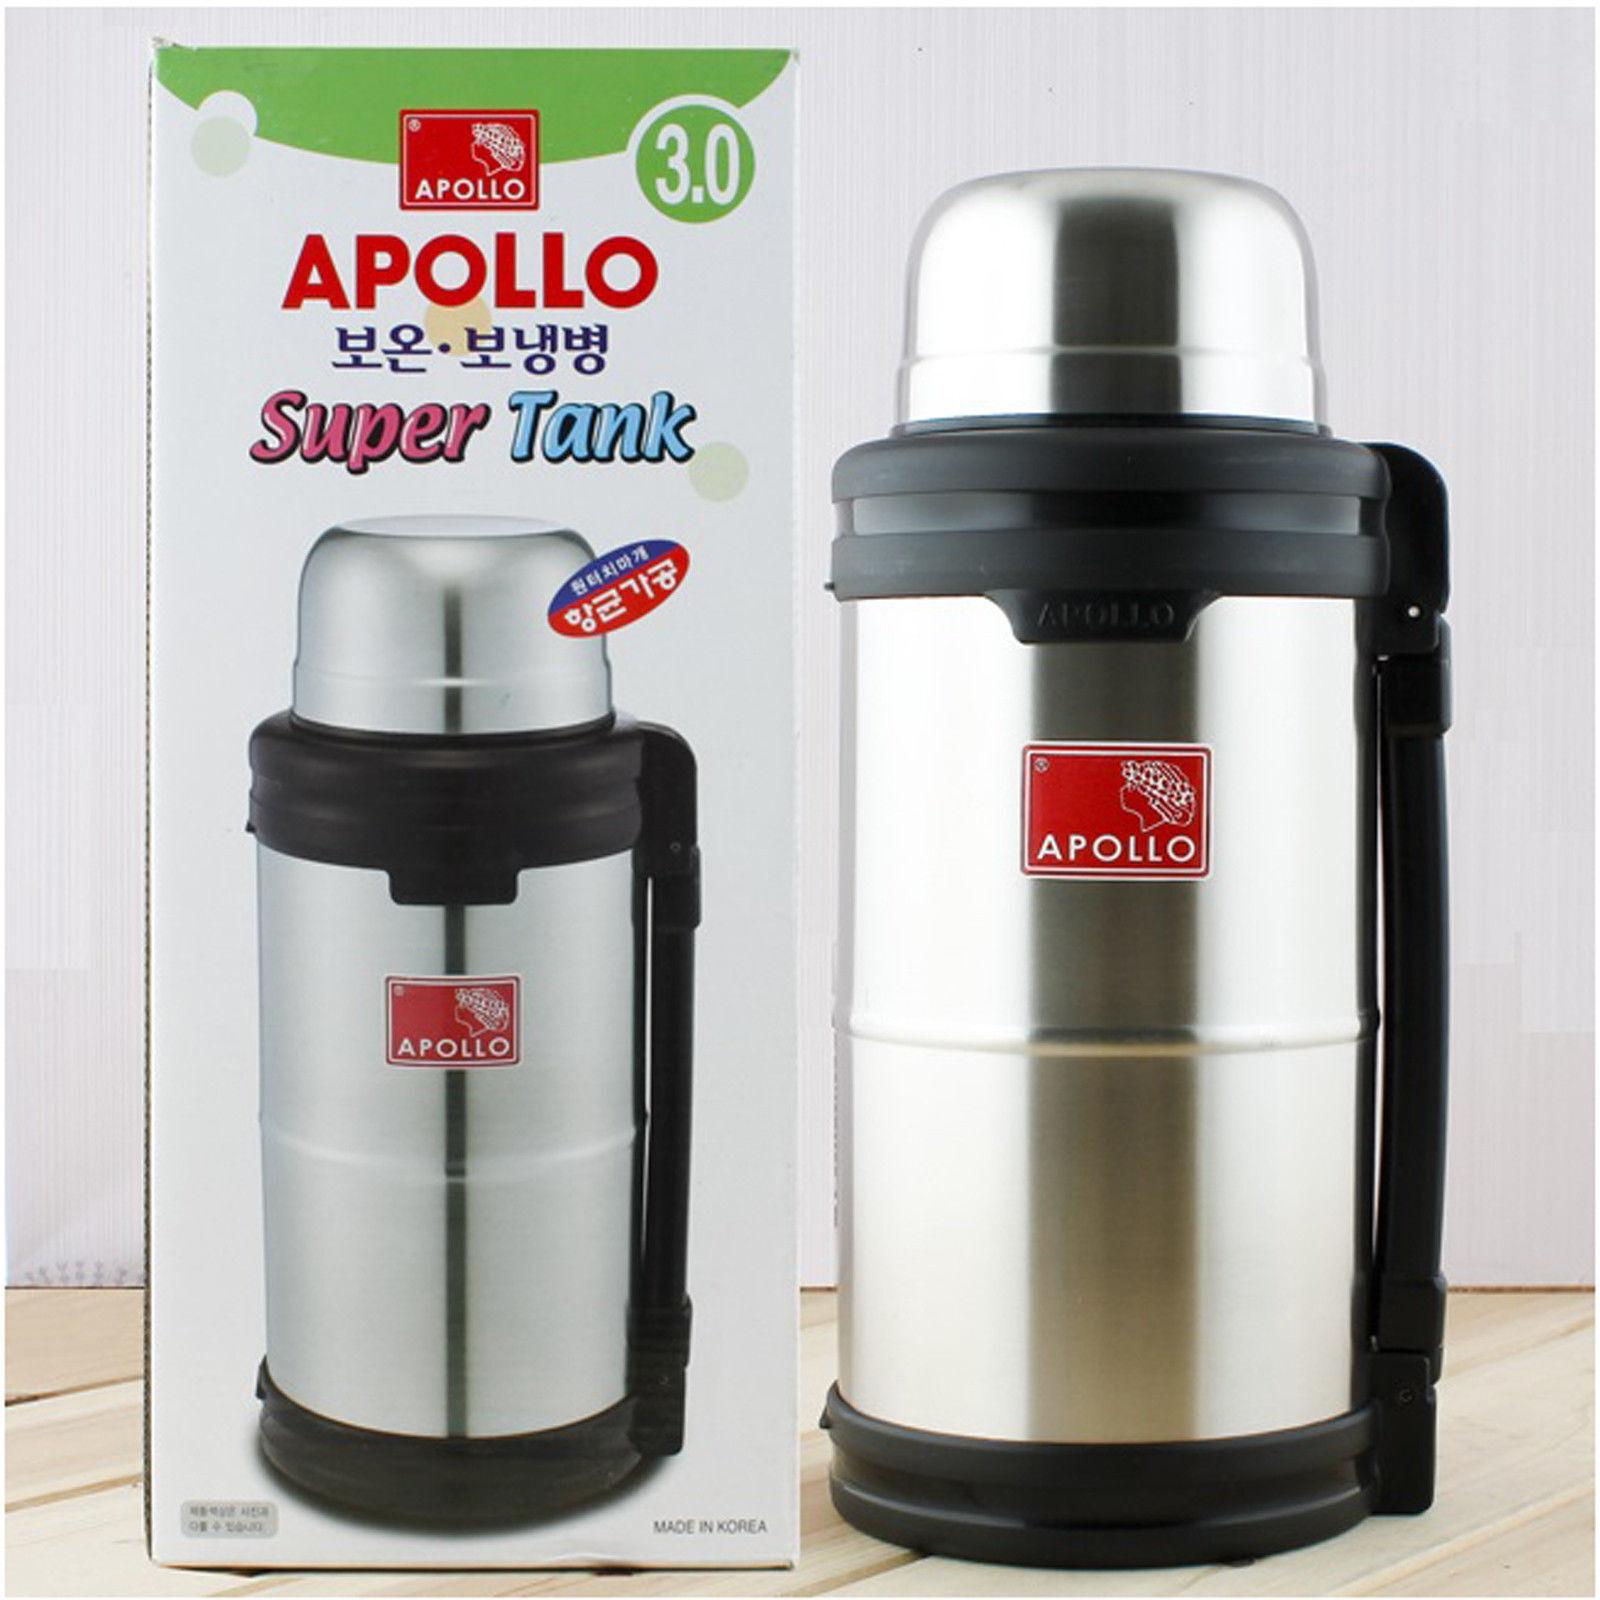 Big isolation sous vide en acier inoxydable chaud cool water drink boisson bouteille carafe